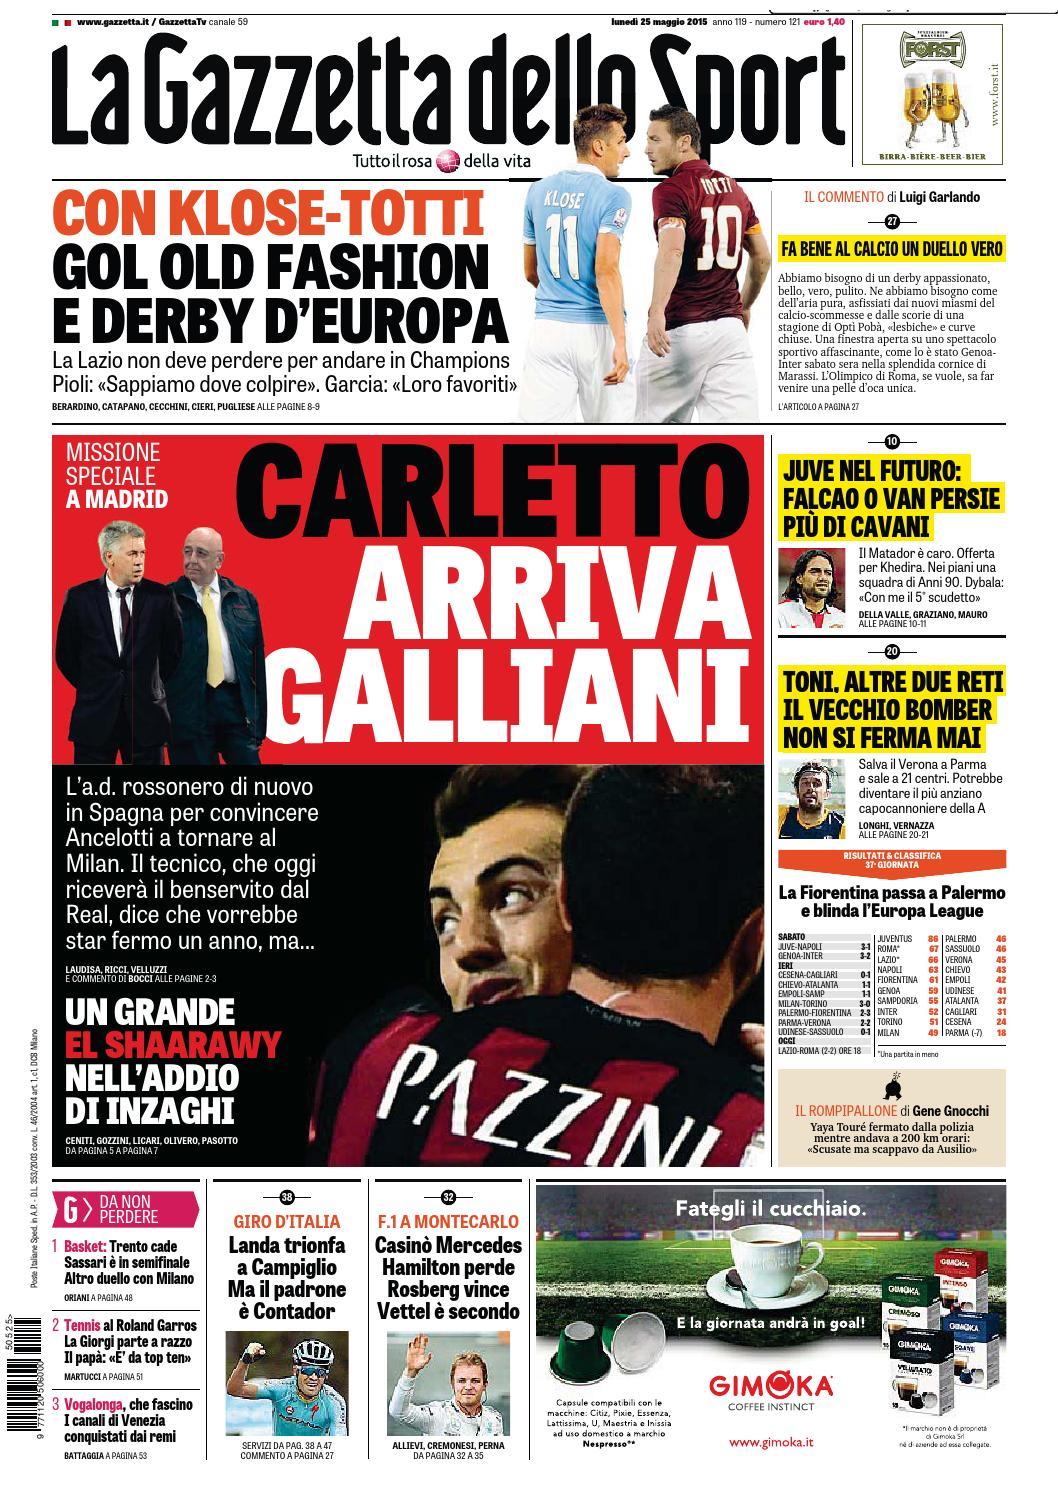 La Gazzetta dello Sport (05 25 2015) by Nguyen Duc Thinh issuu